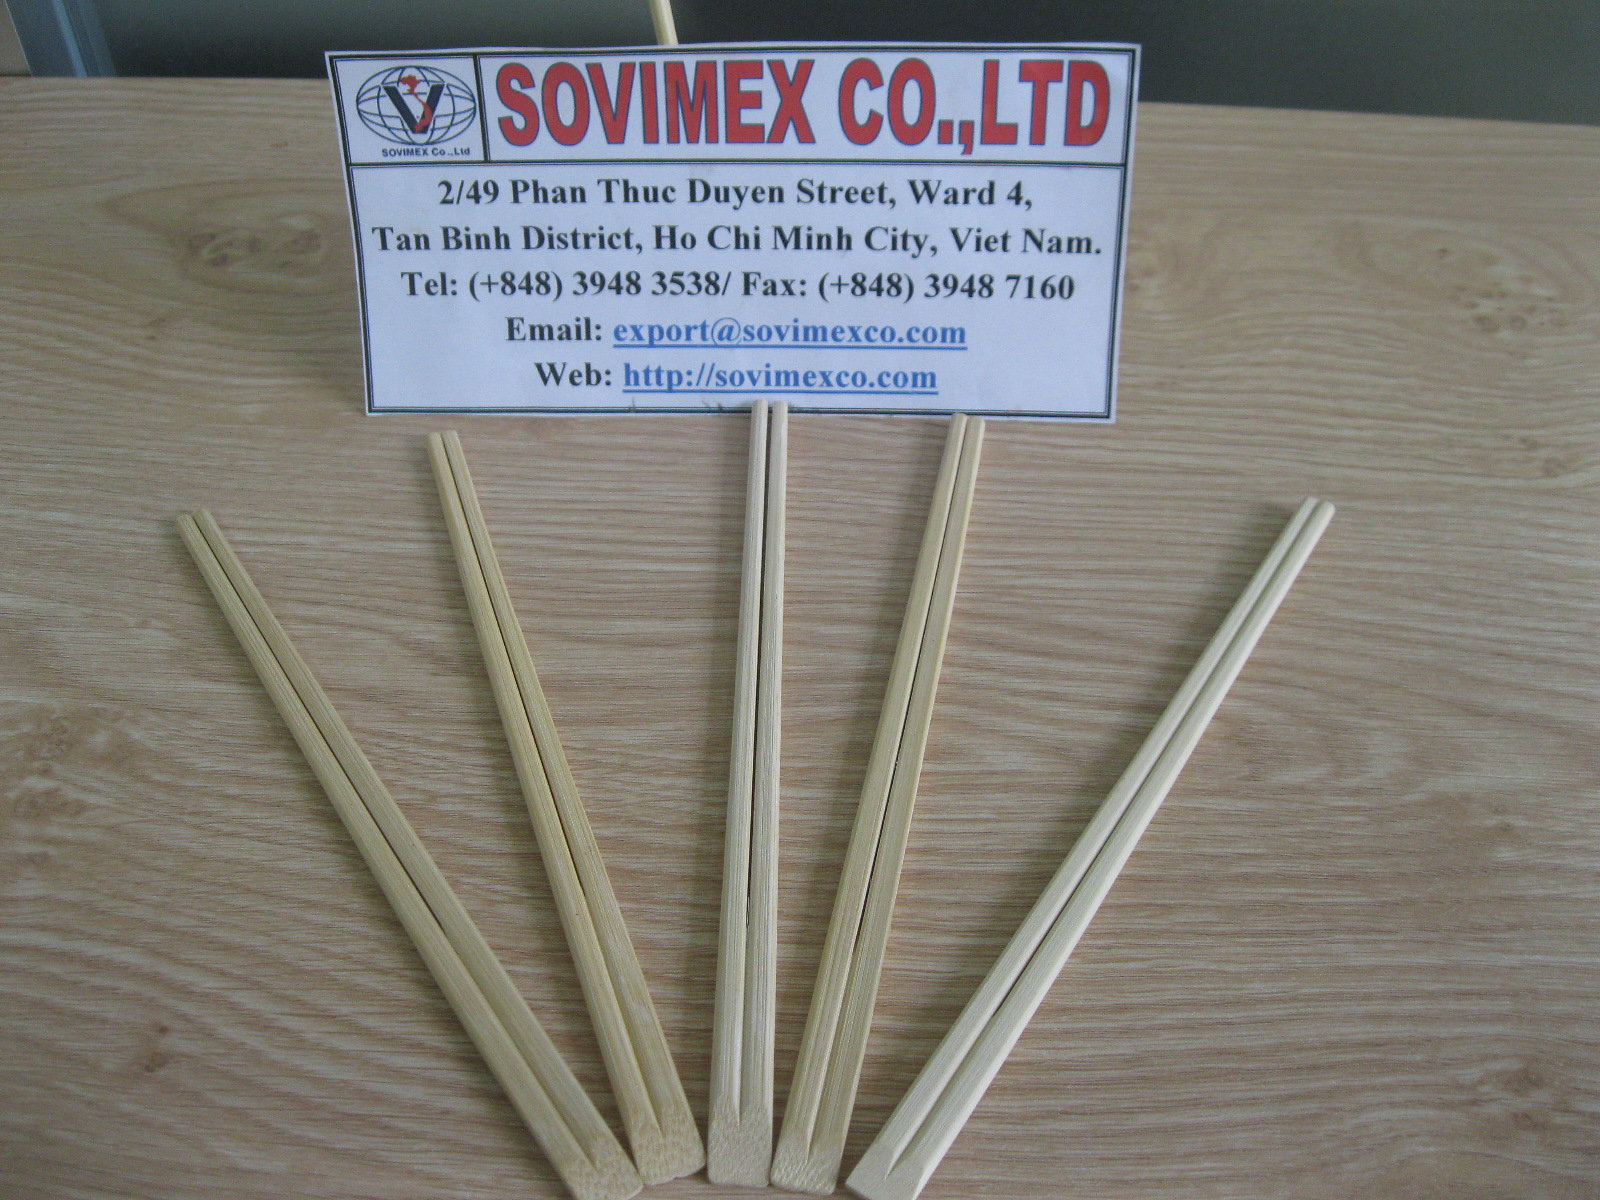 Bamboo Twin Chopsticks